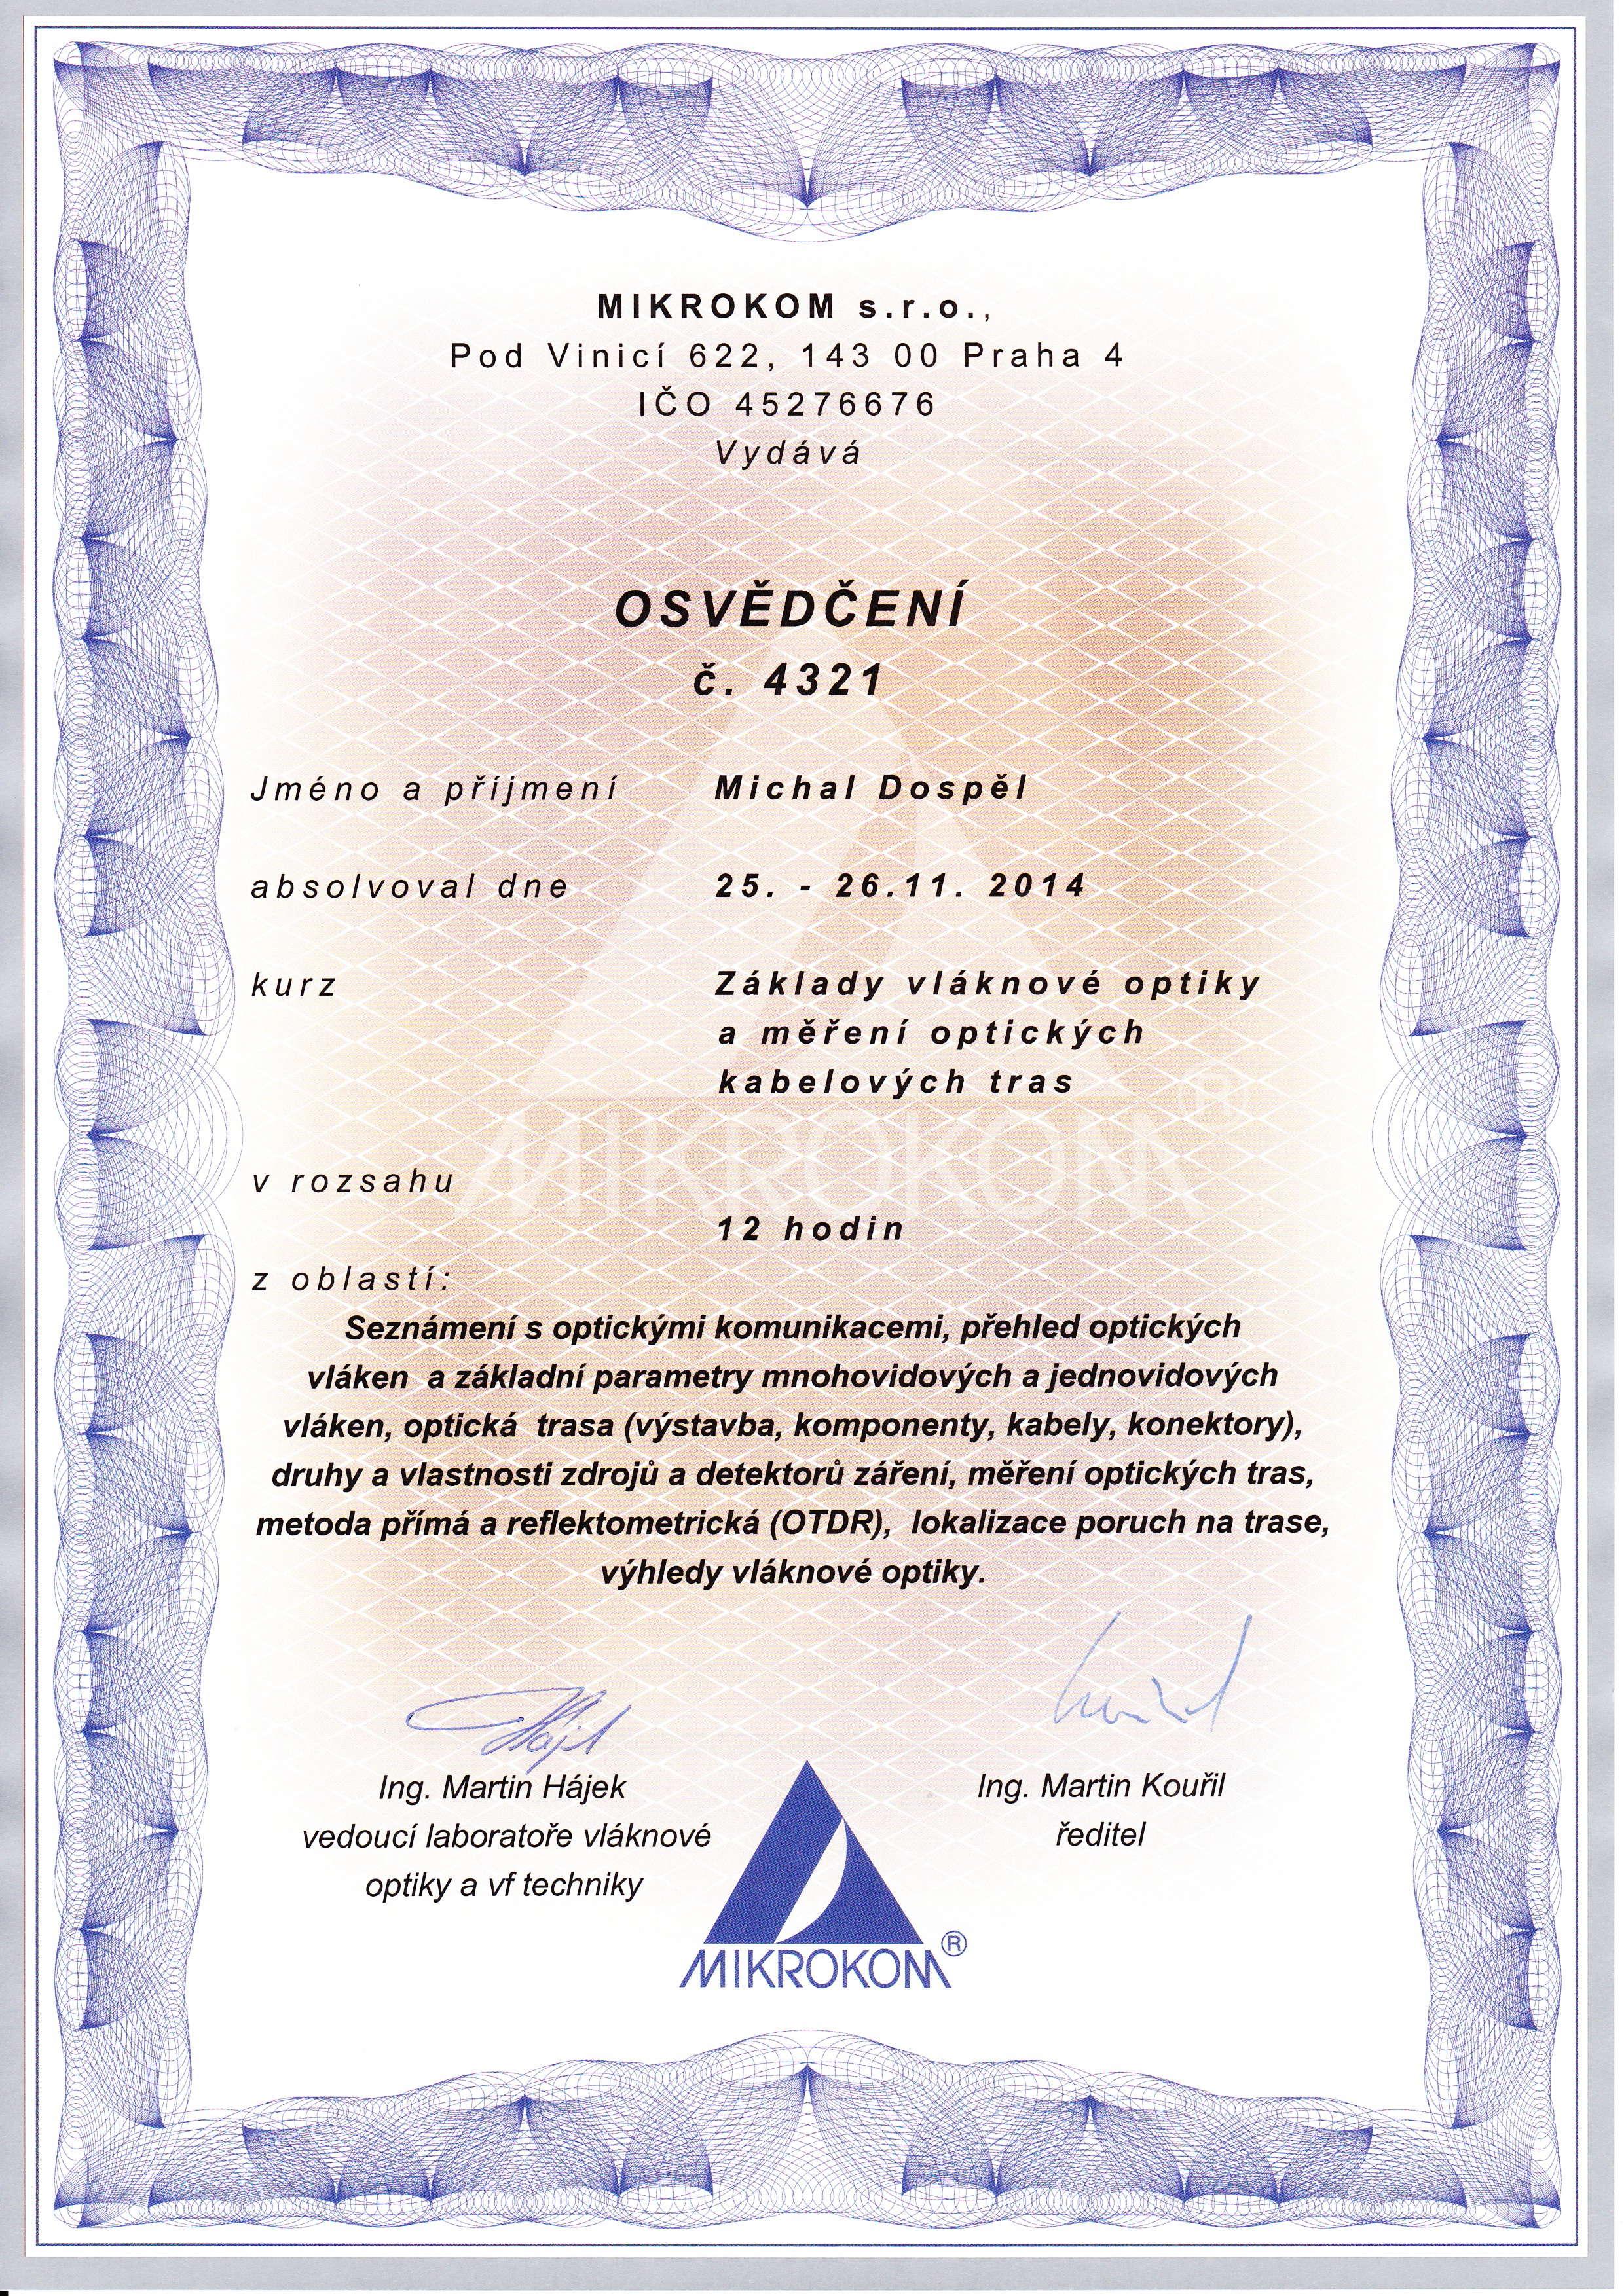 Certifikat Mikrokom CZ optika Michal Dospel